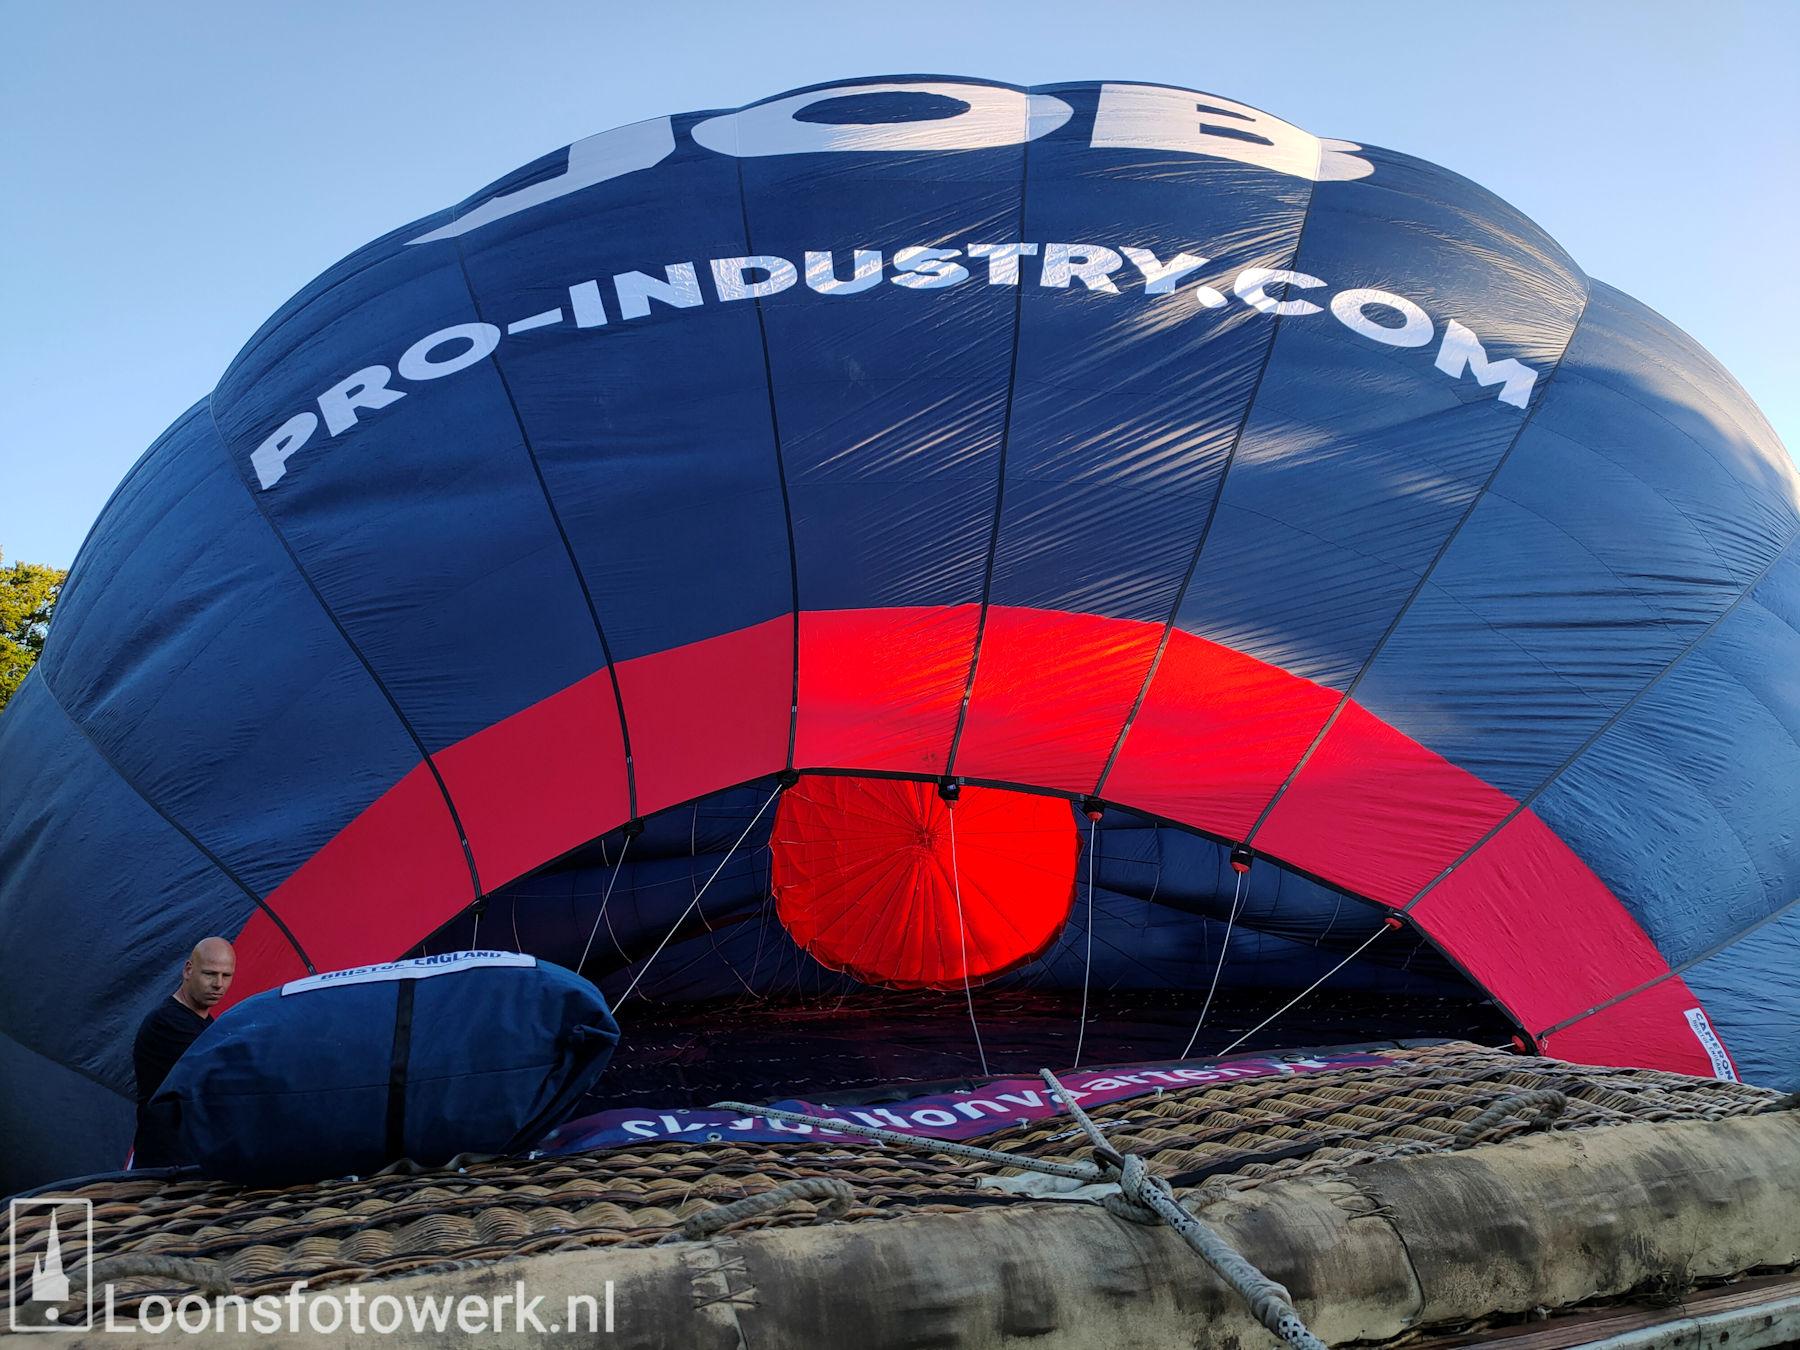 Ballonvaart vanaf de Kasteelweide 16